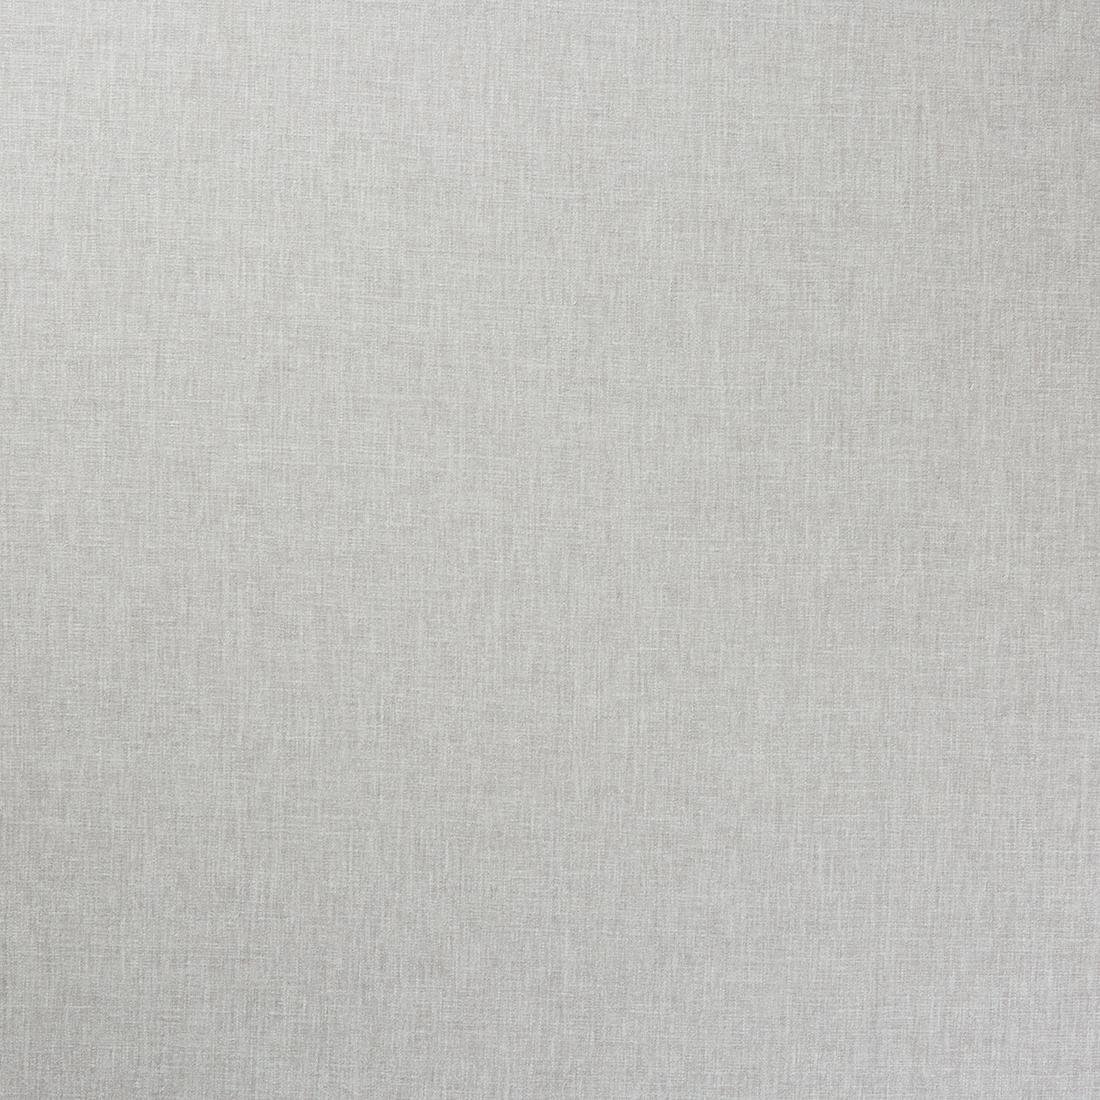 Iceland Flint Upholstery Fabric